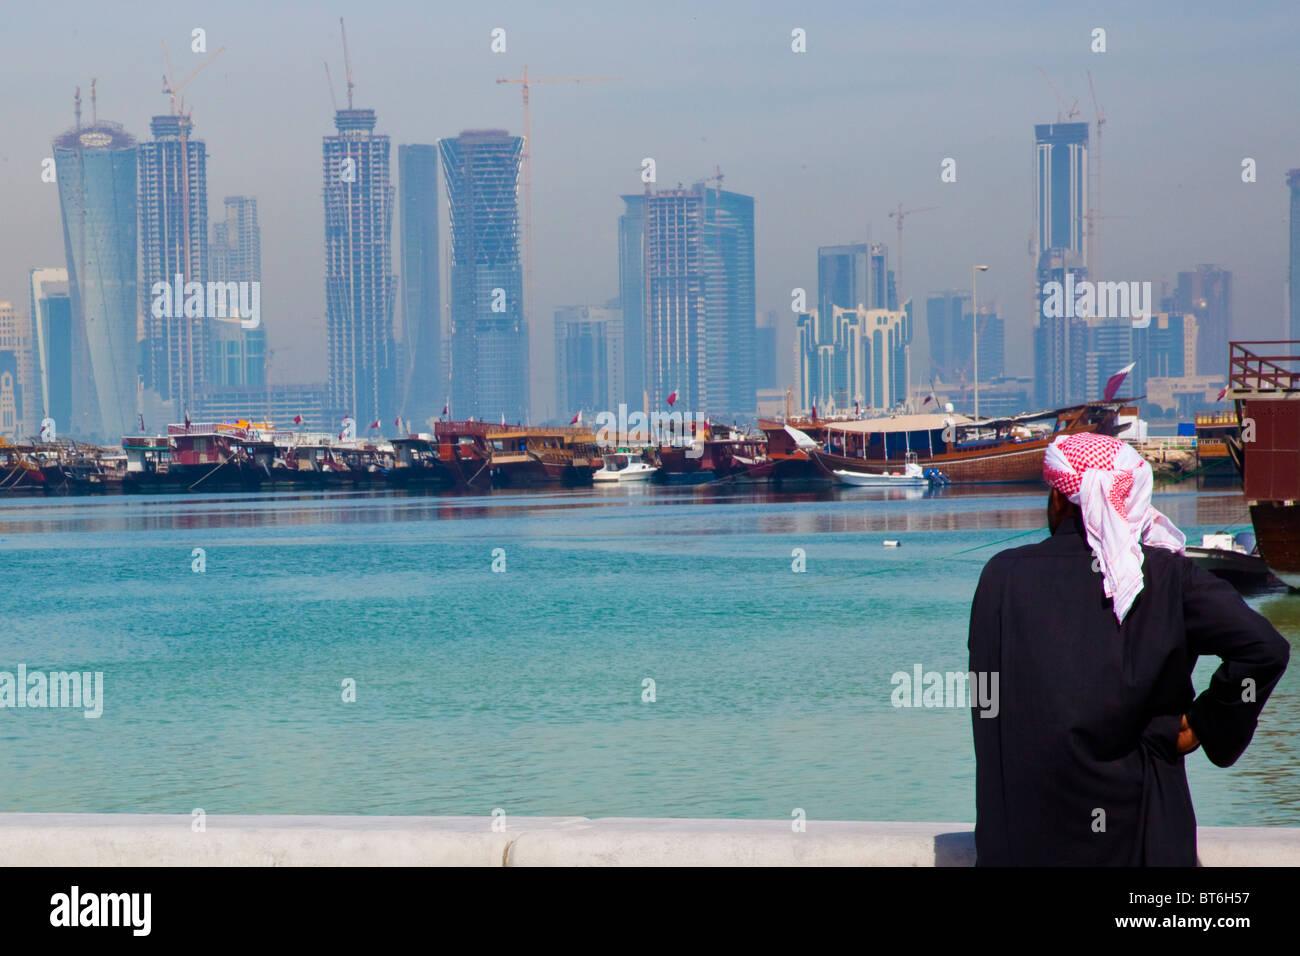 La construction de gratte-ciel Skyline in Doha Qatar Photo Stock